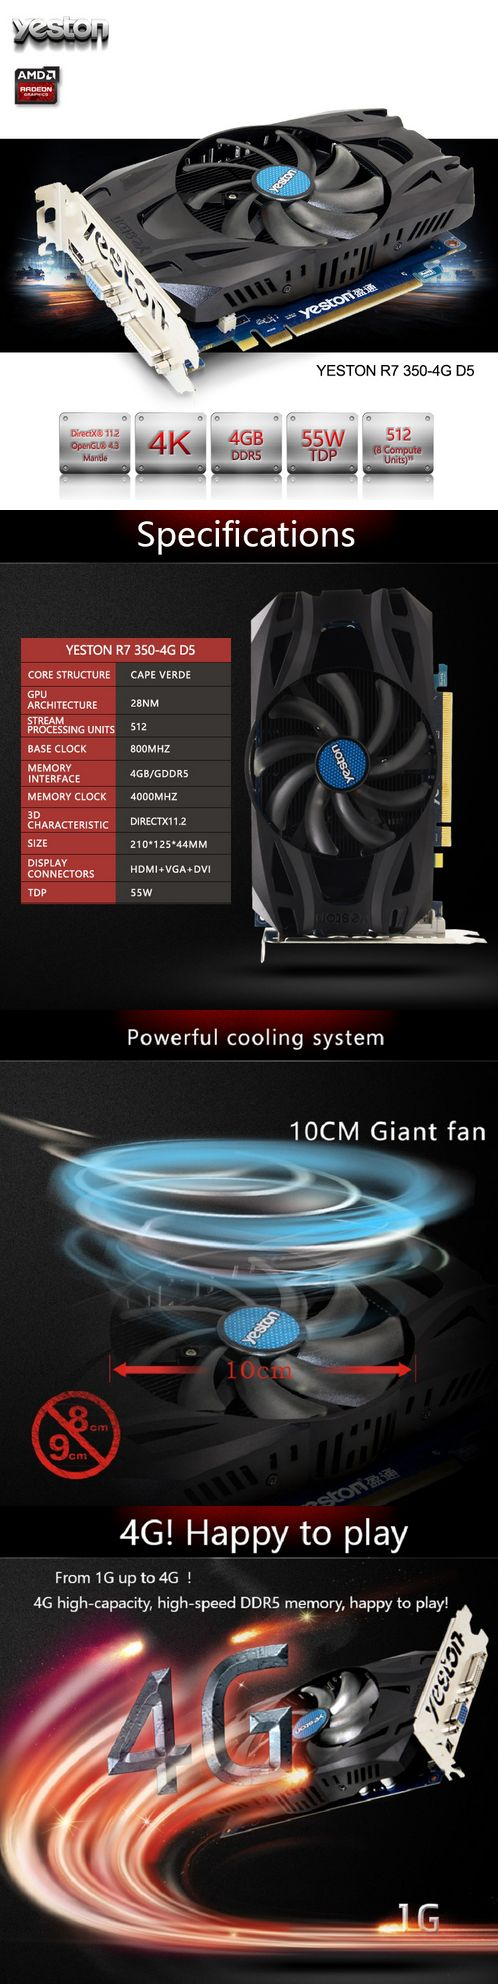 Yeston ATI Radeon R7 350 GPU 4GB GDDR5 128bit Gaming Desktop computer PC Video Graphics Cards support VGA/DVI/HDMI PCI-E X16 3.0      http://s.click.aliexpress.com/e/r7uBurF